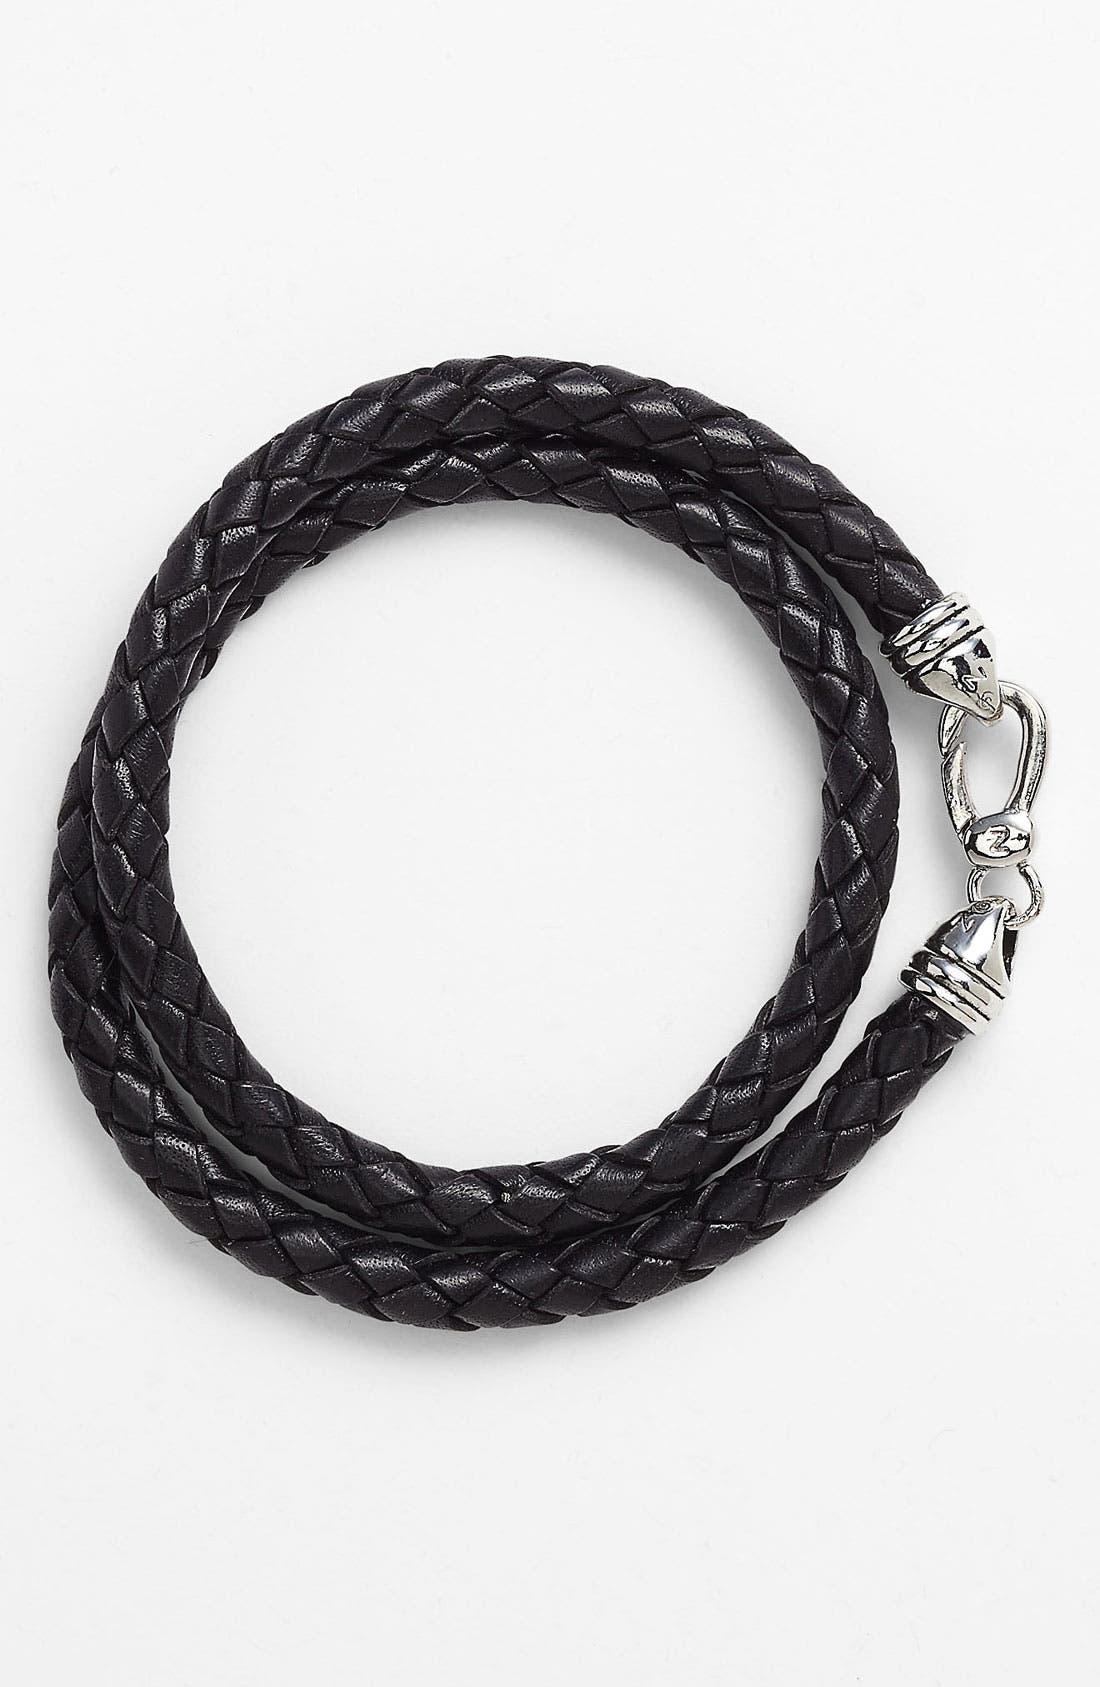 Alternate Image 1 Selected - Zack Wrap Braided Leather Bracelet